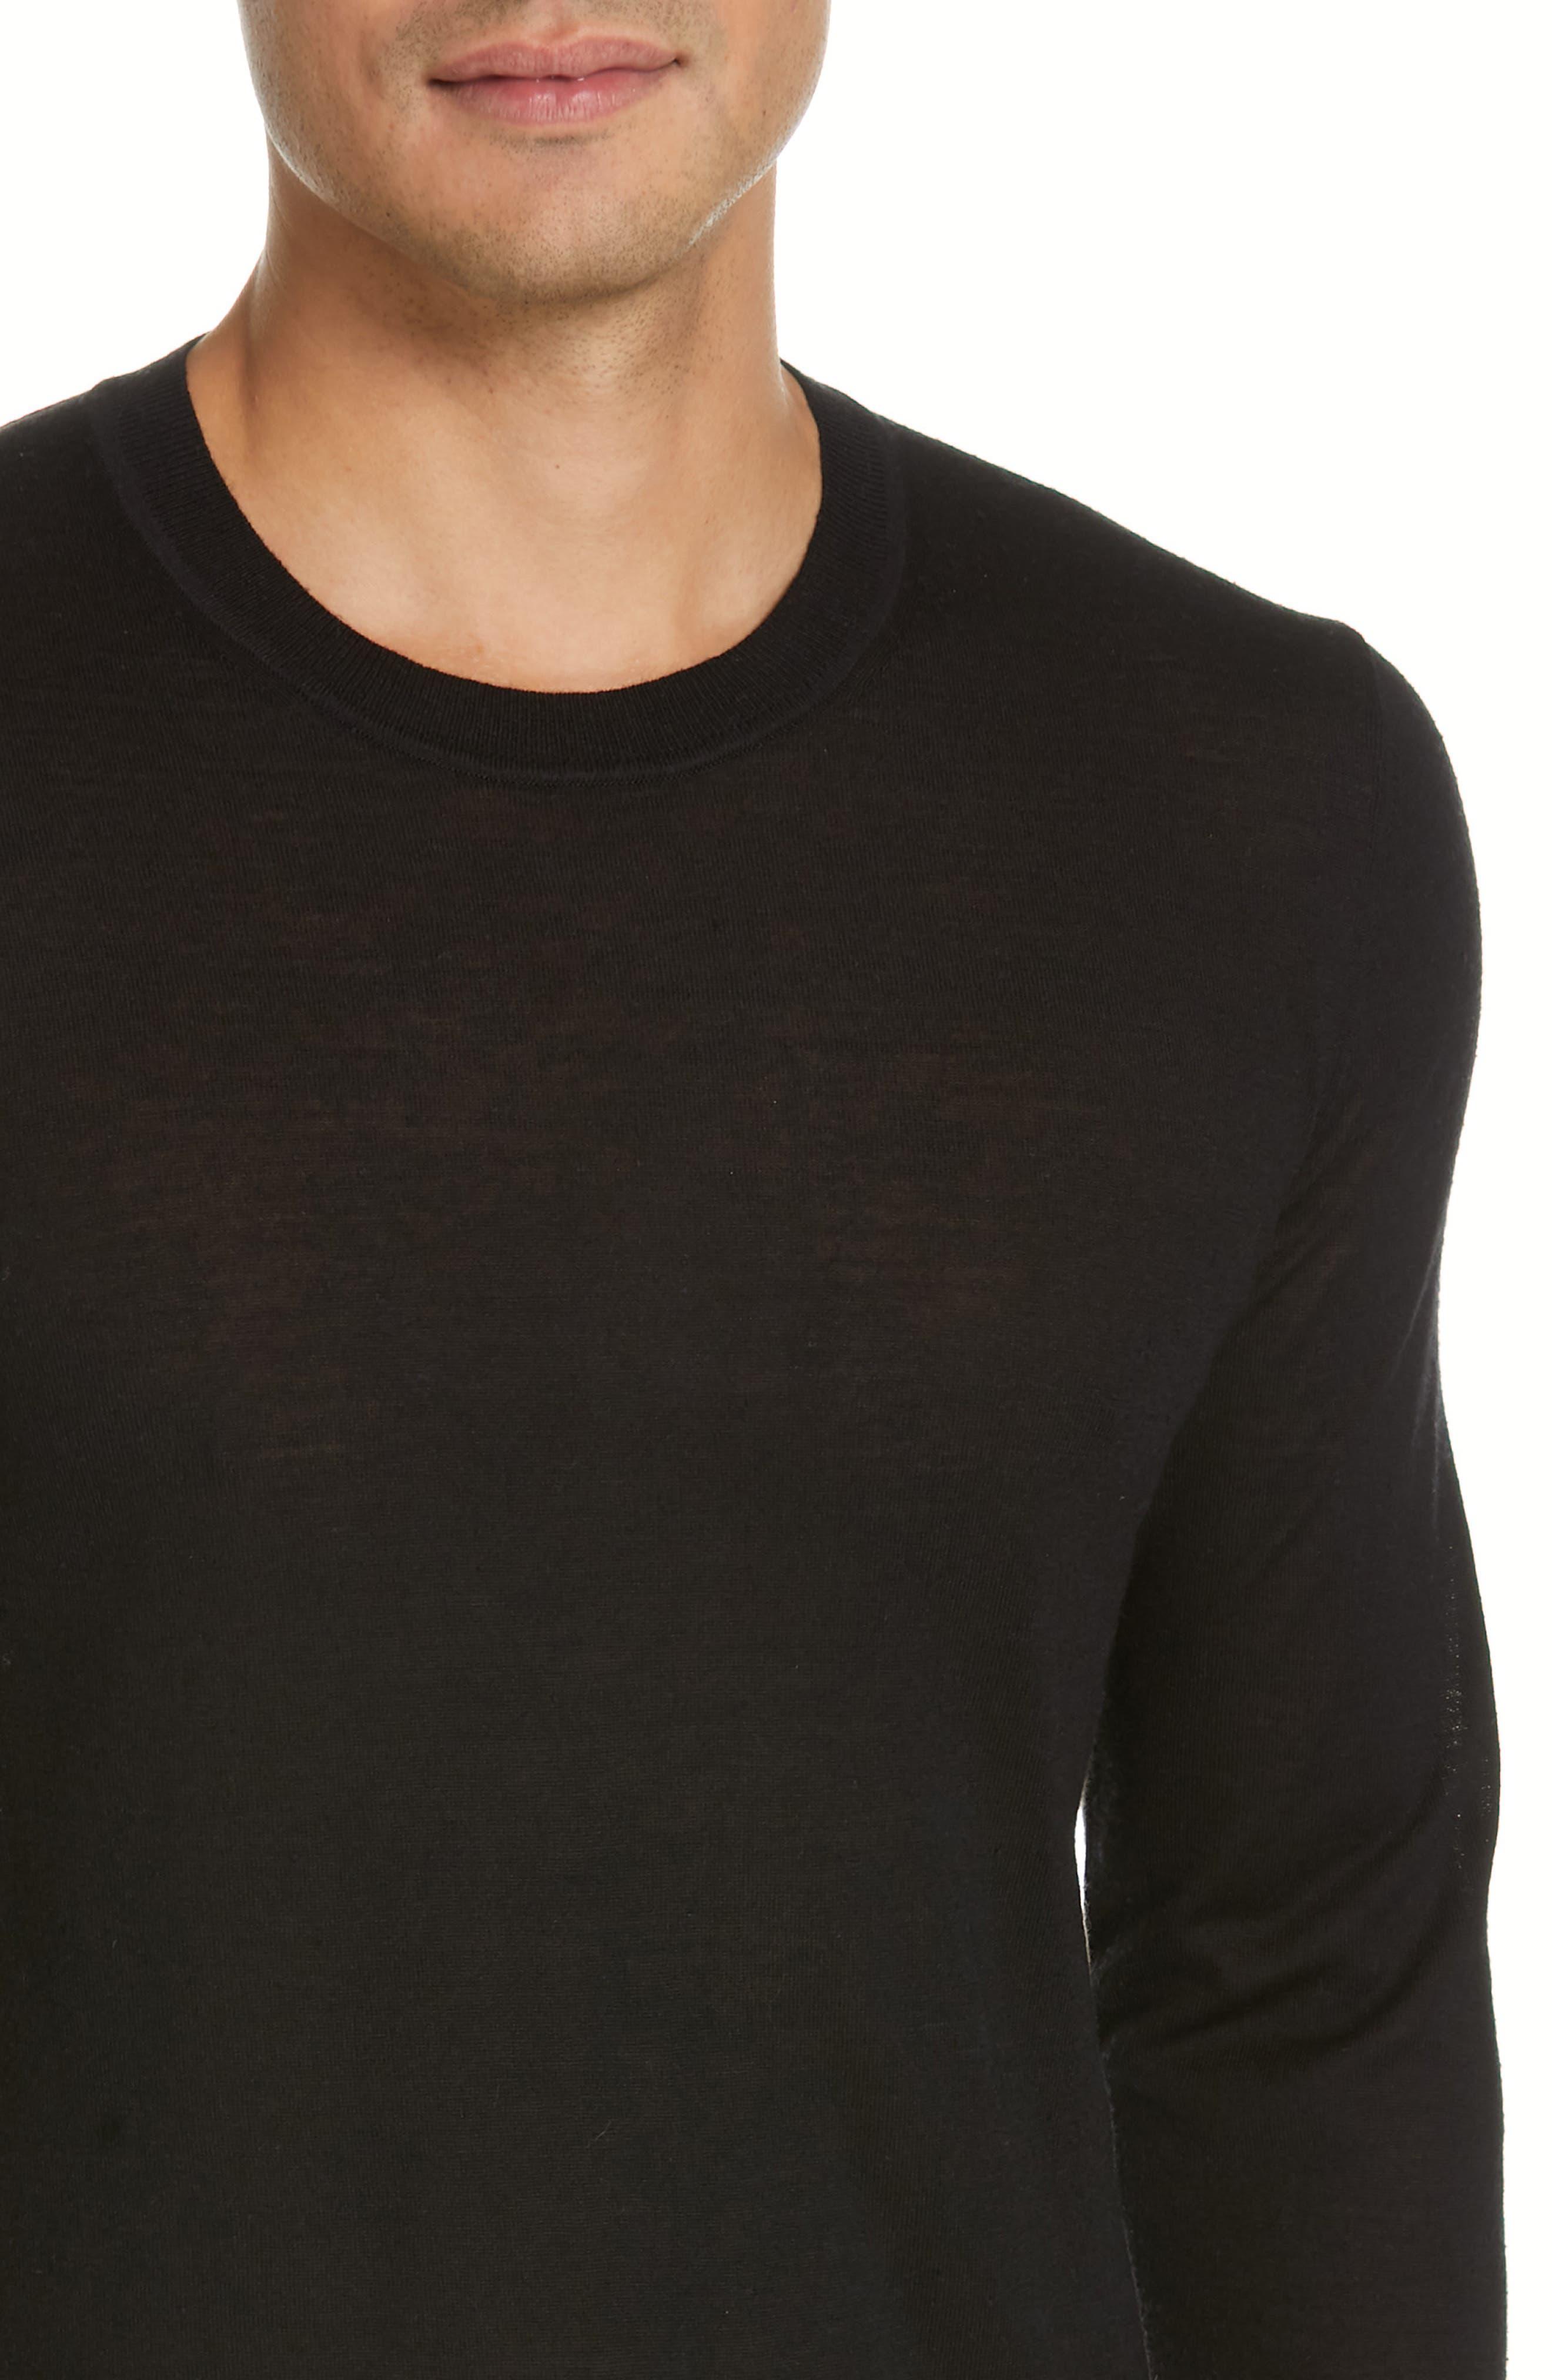 HELMUT LANG, Back Logo Wool & Silk Sweatshirt, Alternate thumbnail 4, color, BLACK